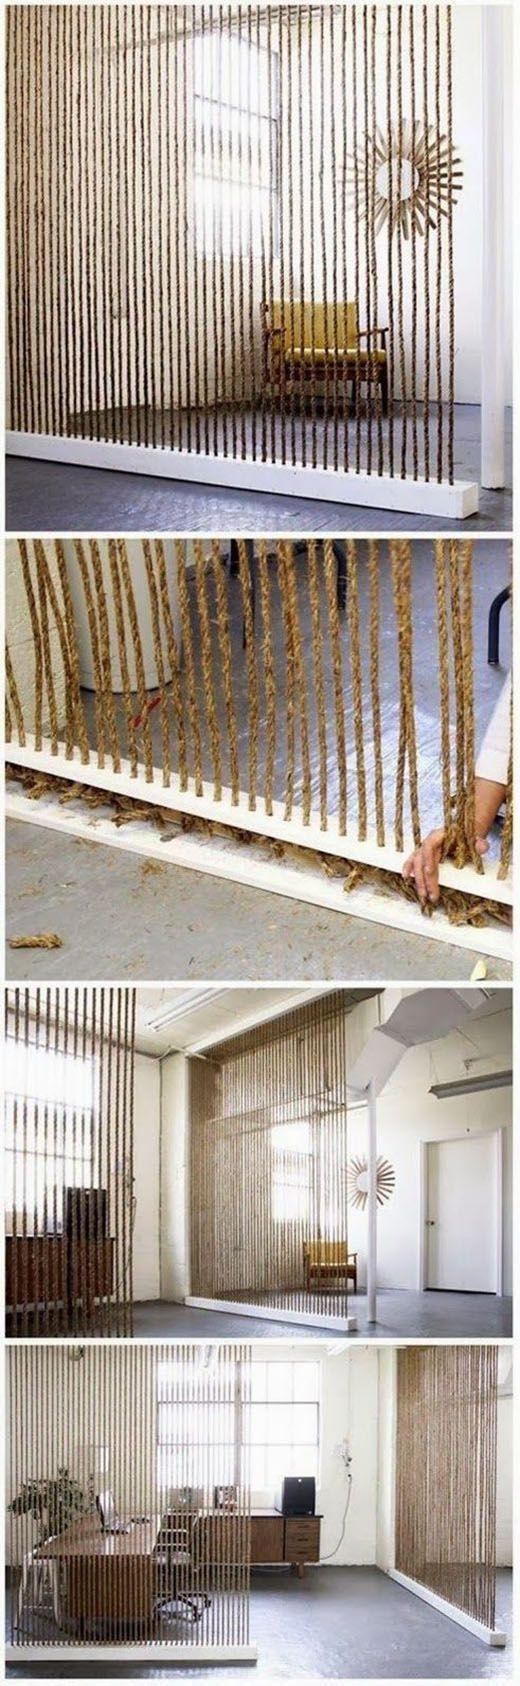 Cool Decor Idea | DIY & Crafts